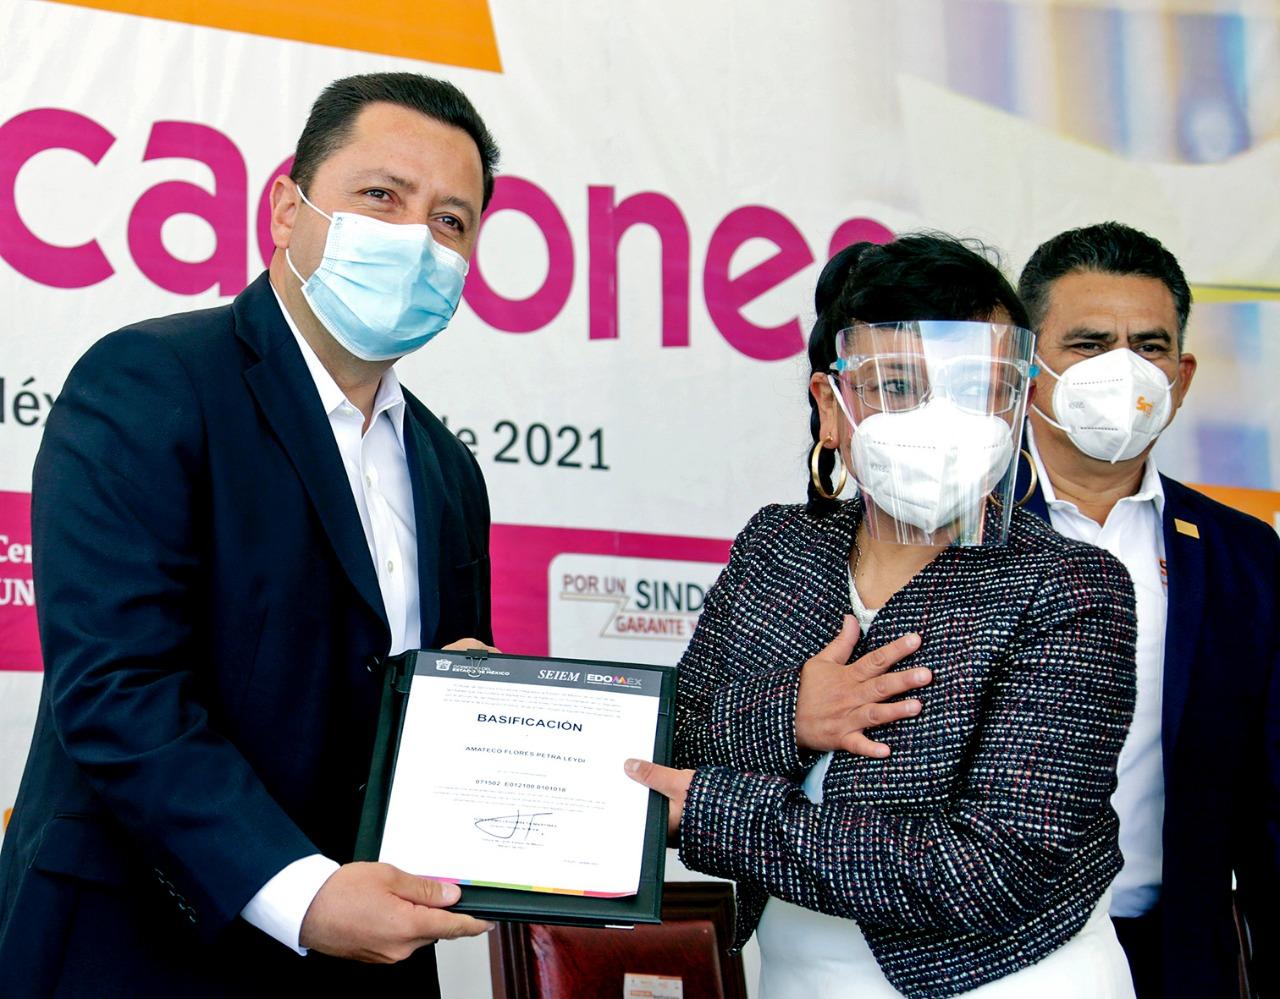 RECONOCEN A DOCENTES FEDERALIZADOS DEL EDOMÉX CON CONSTANCIAS DE BASIFICACIÓN